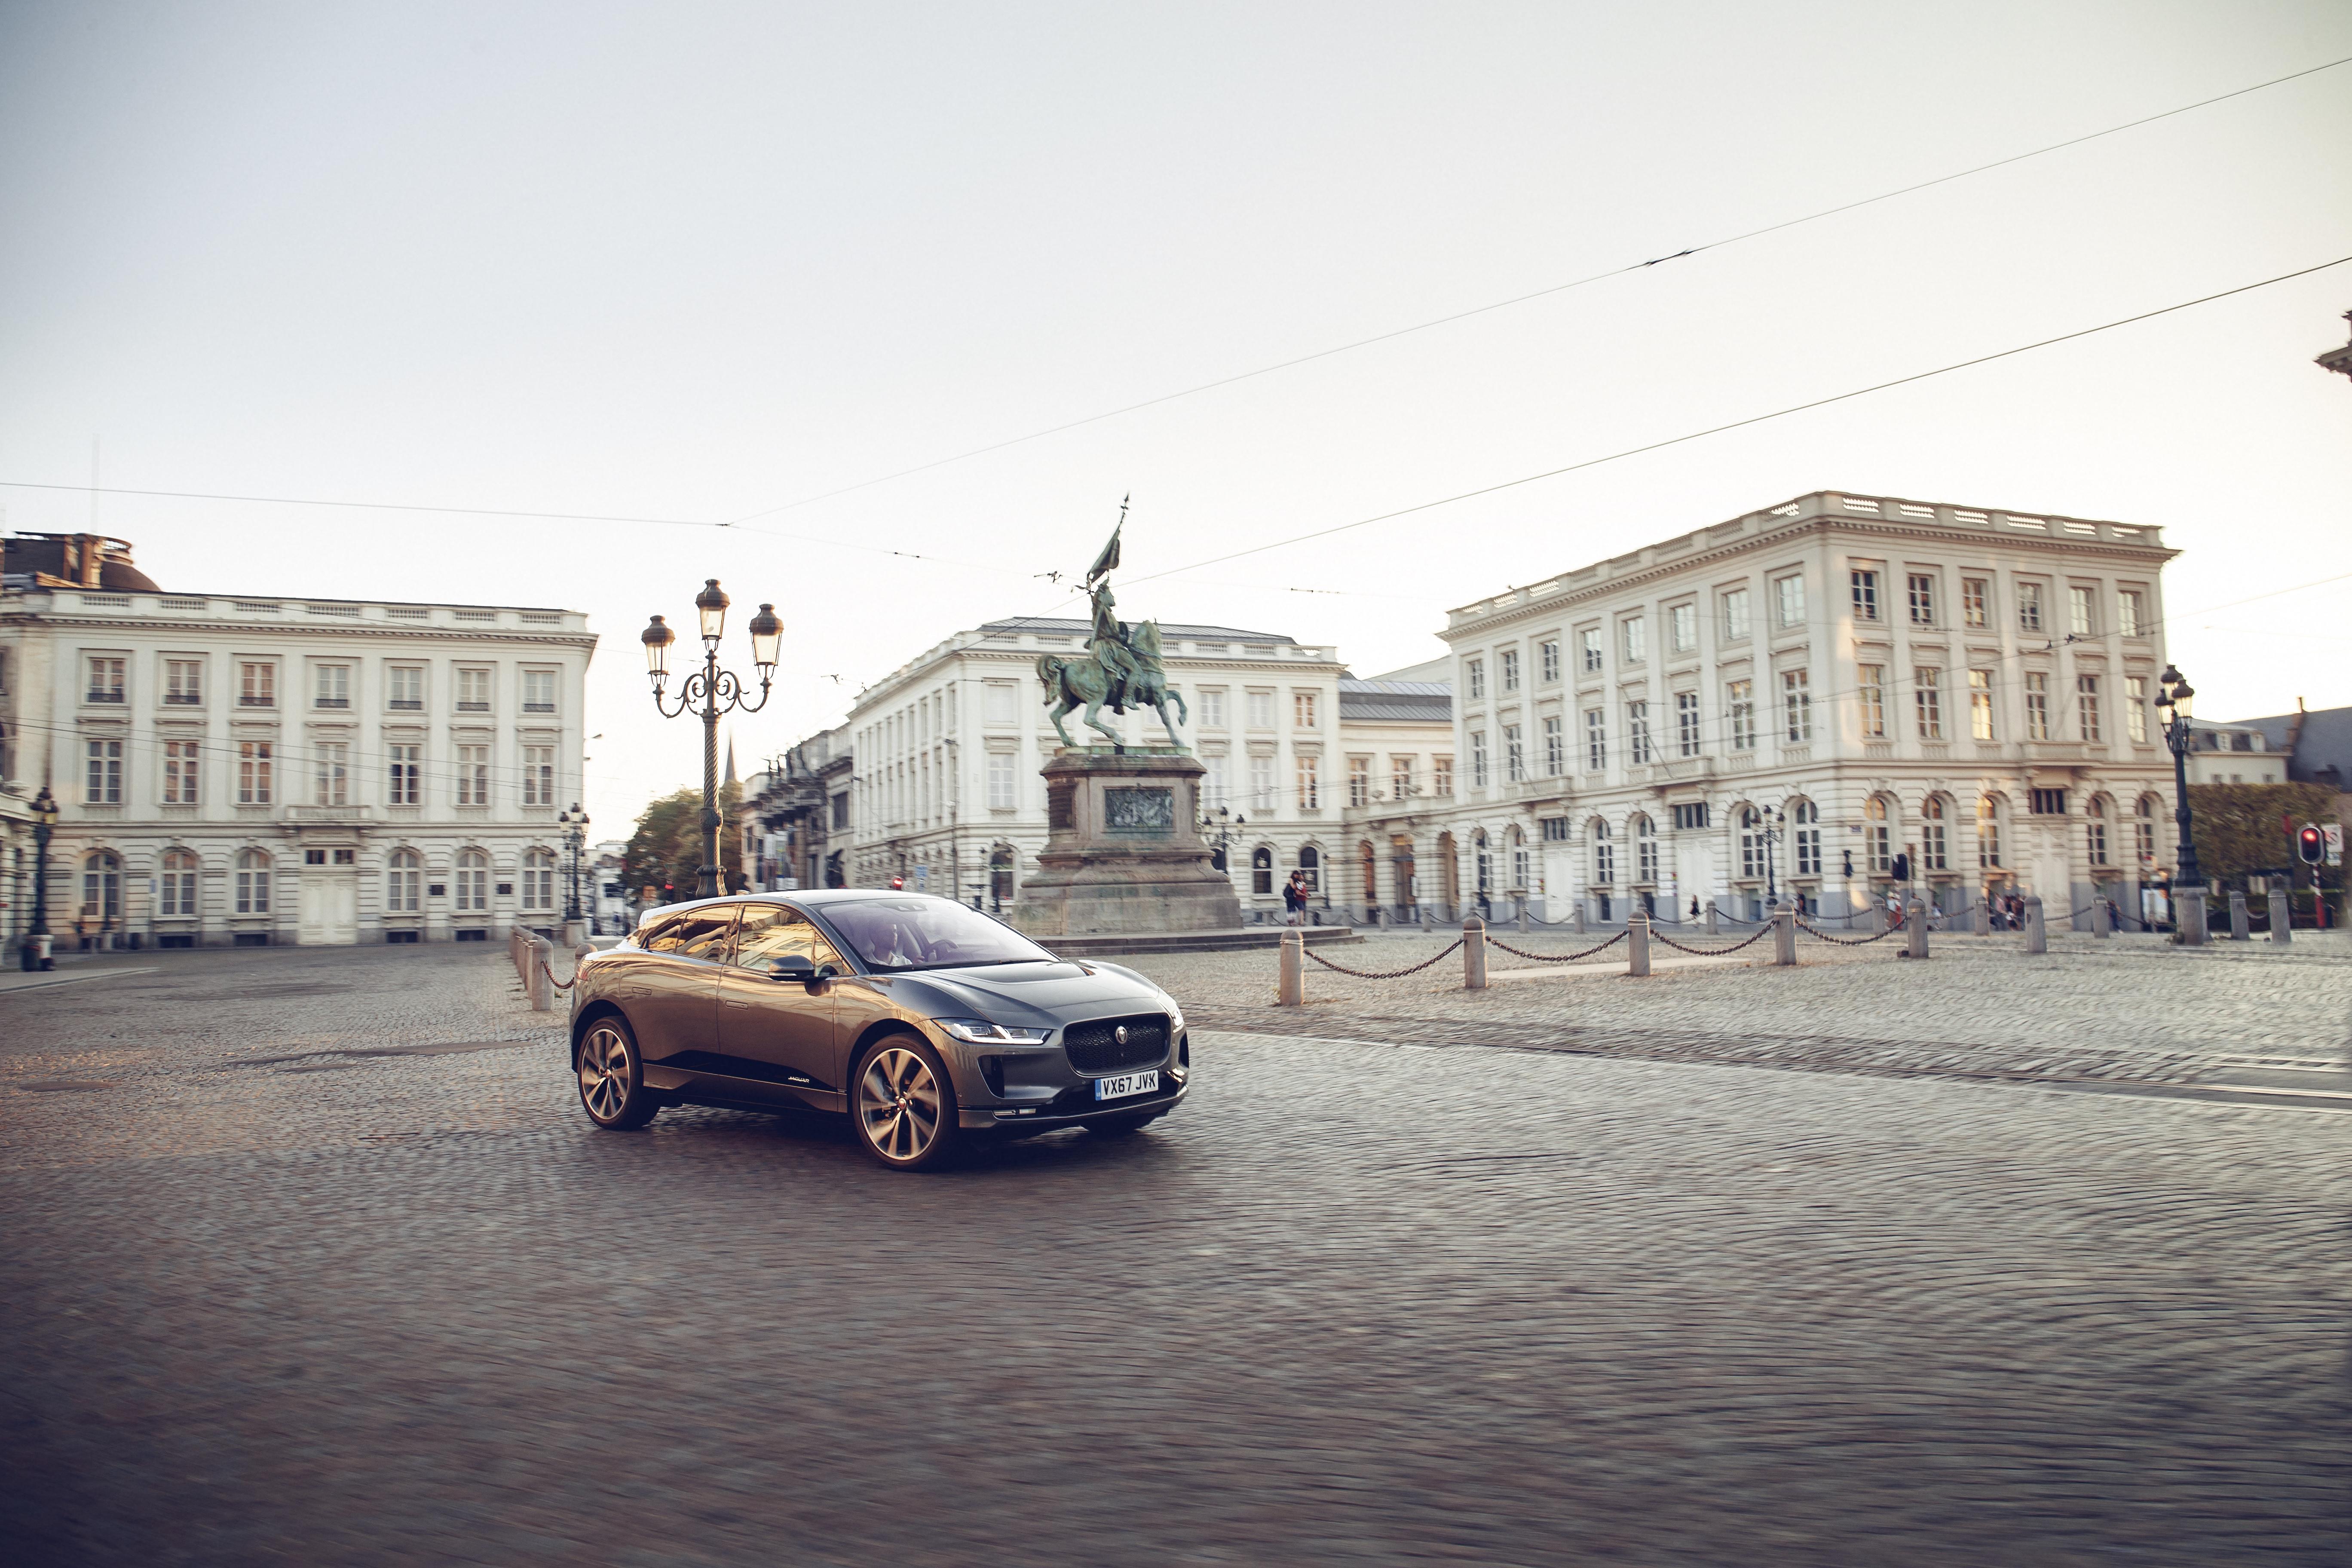 Xe-dien-SUV-Jaguar-I-PACE-lap-ky-luc-chay-369km-sau-1-lan-sac-anh-5